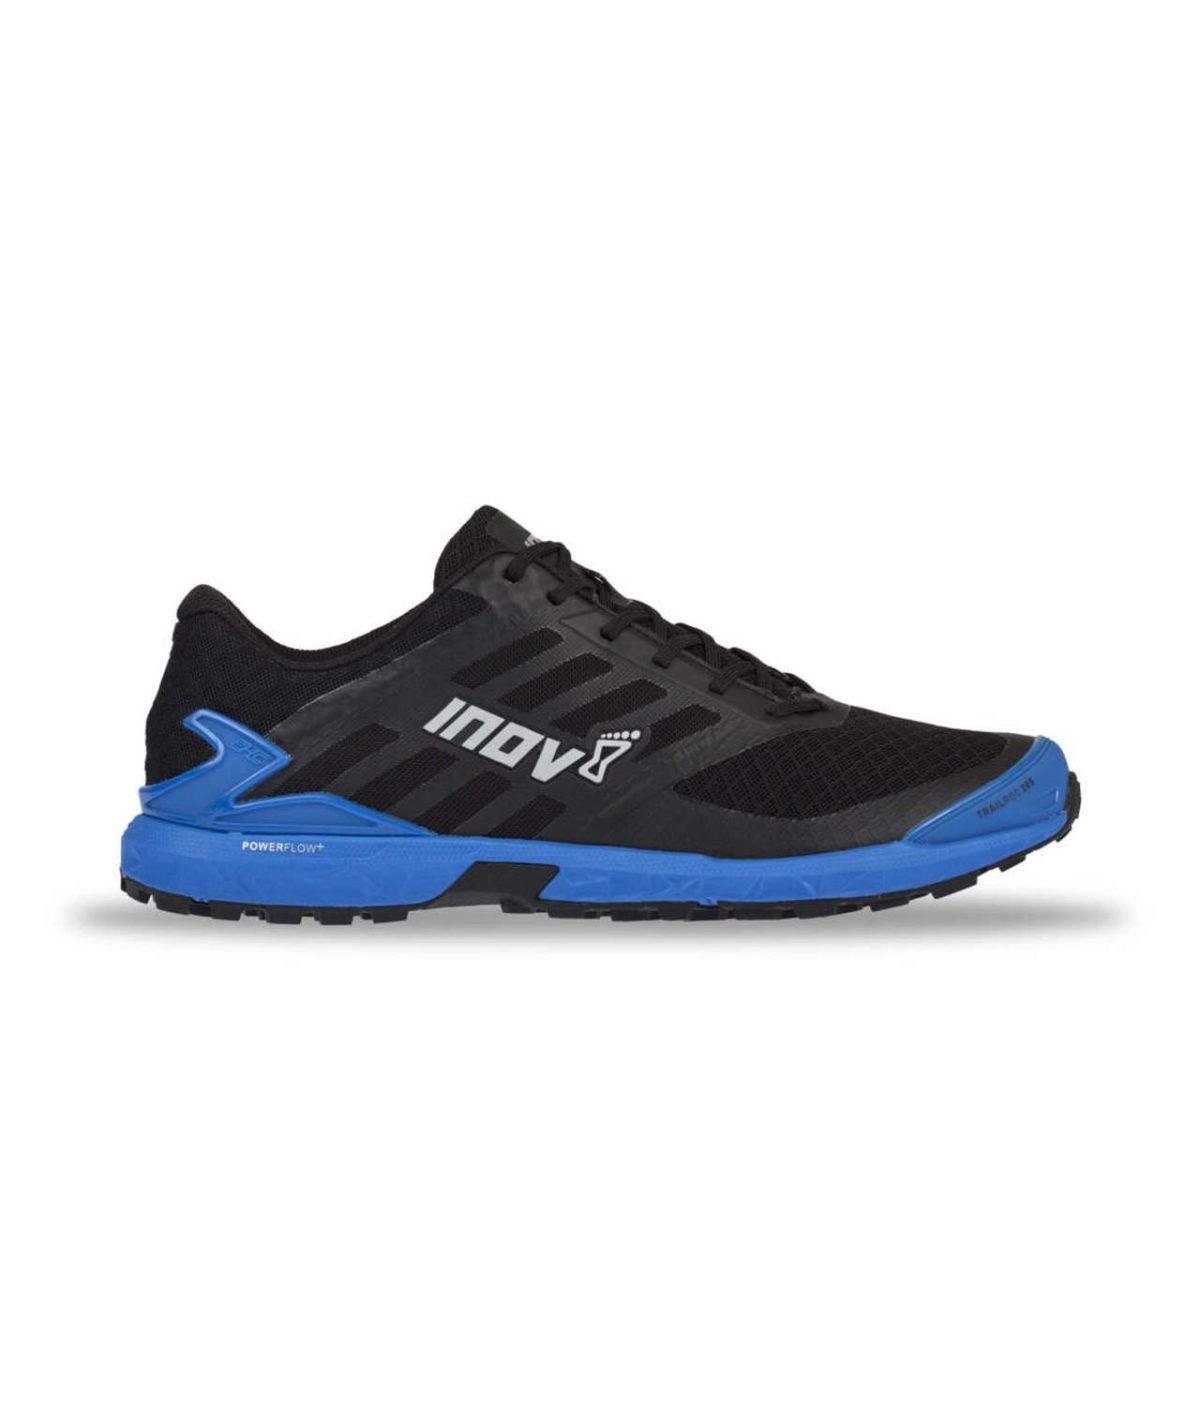 inov 8 Trailroc 285 trail shoe black blue FastandLight 7 1